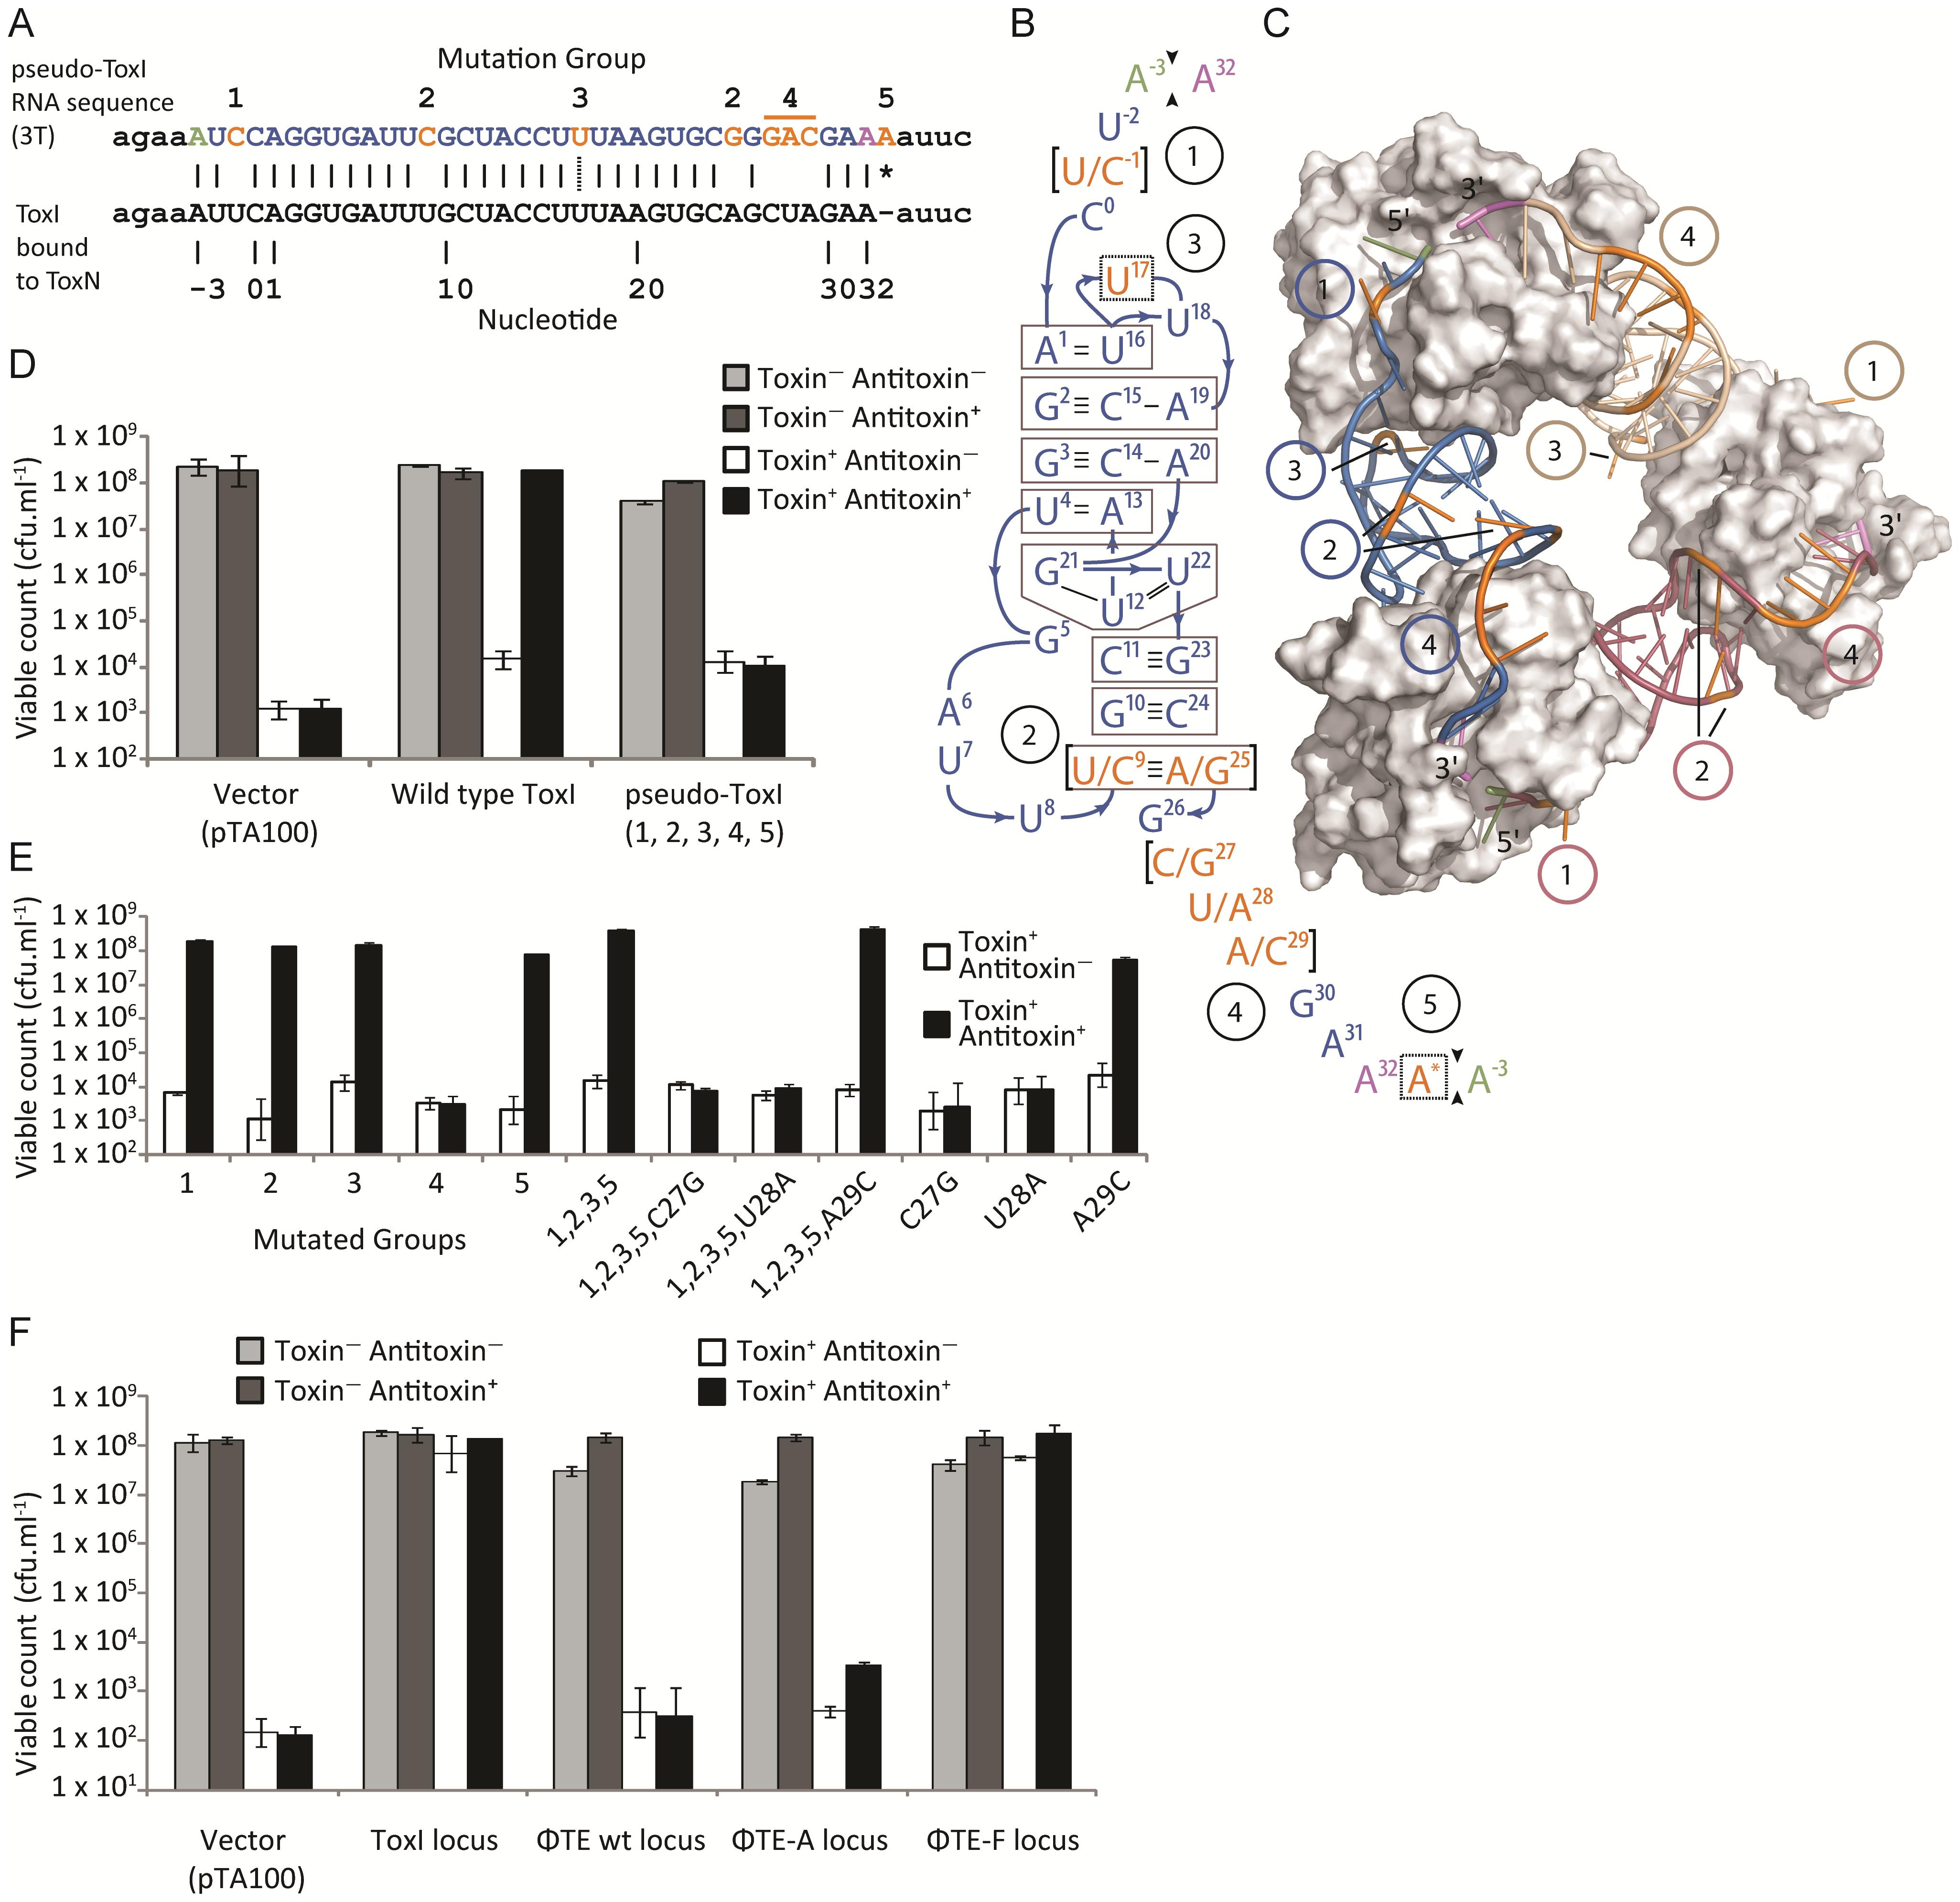 Analysis of pseudo-ToxI as a potential antitoxin.